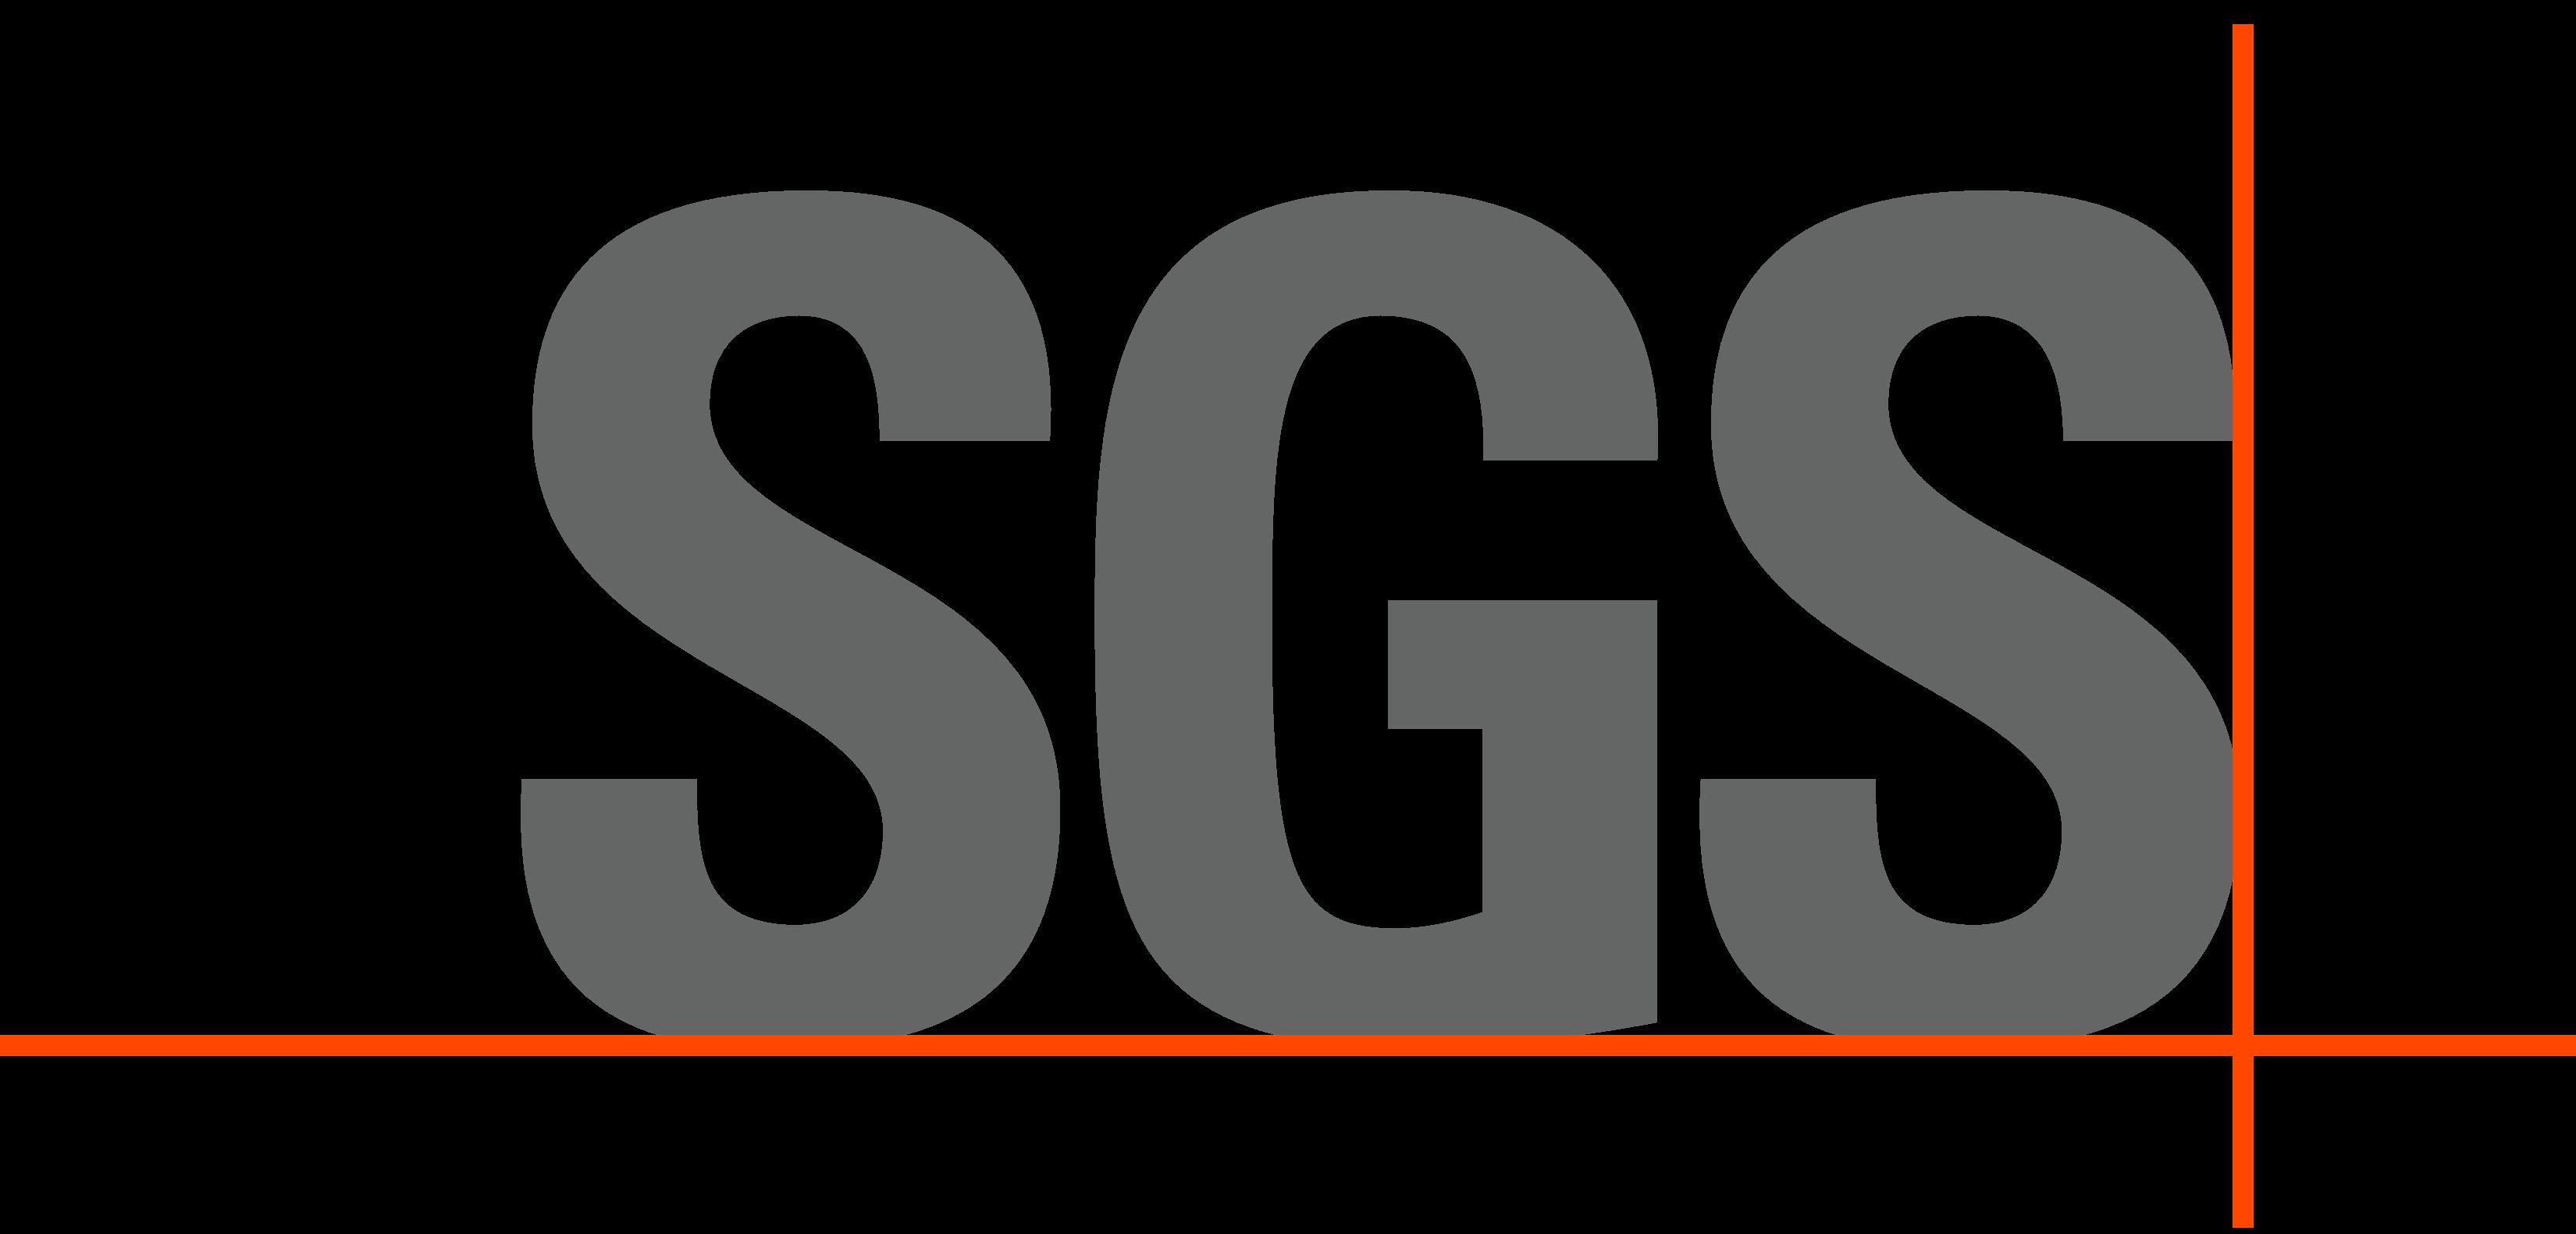 SGS_LiDAR